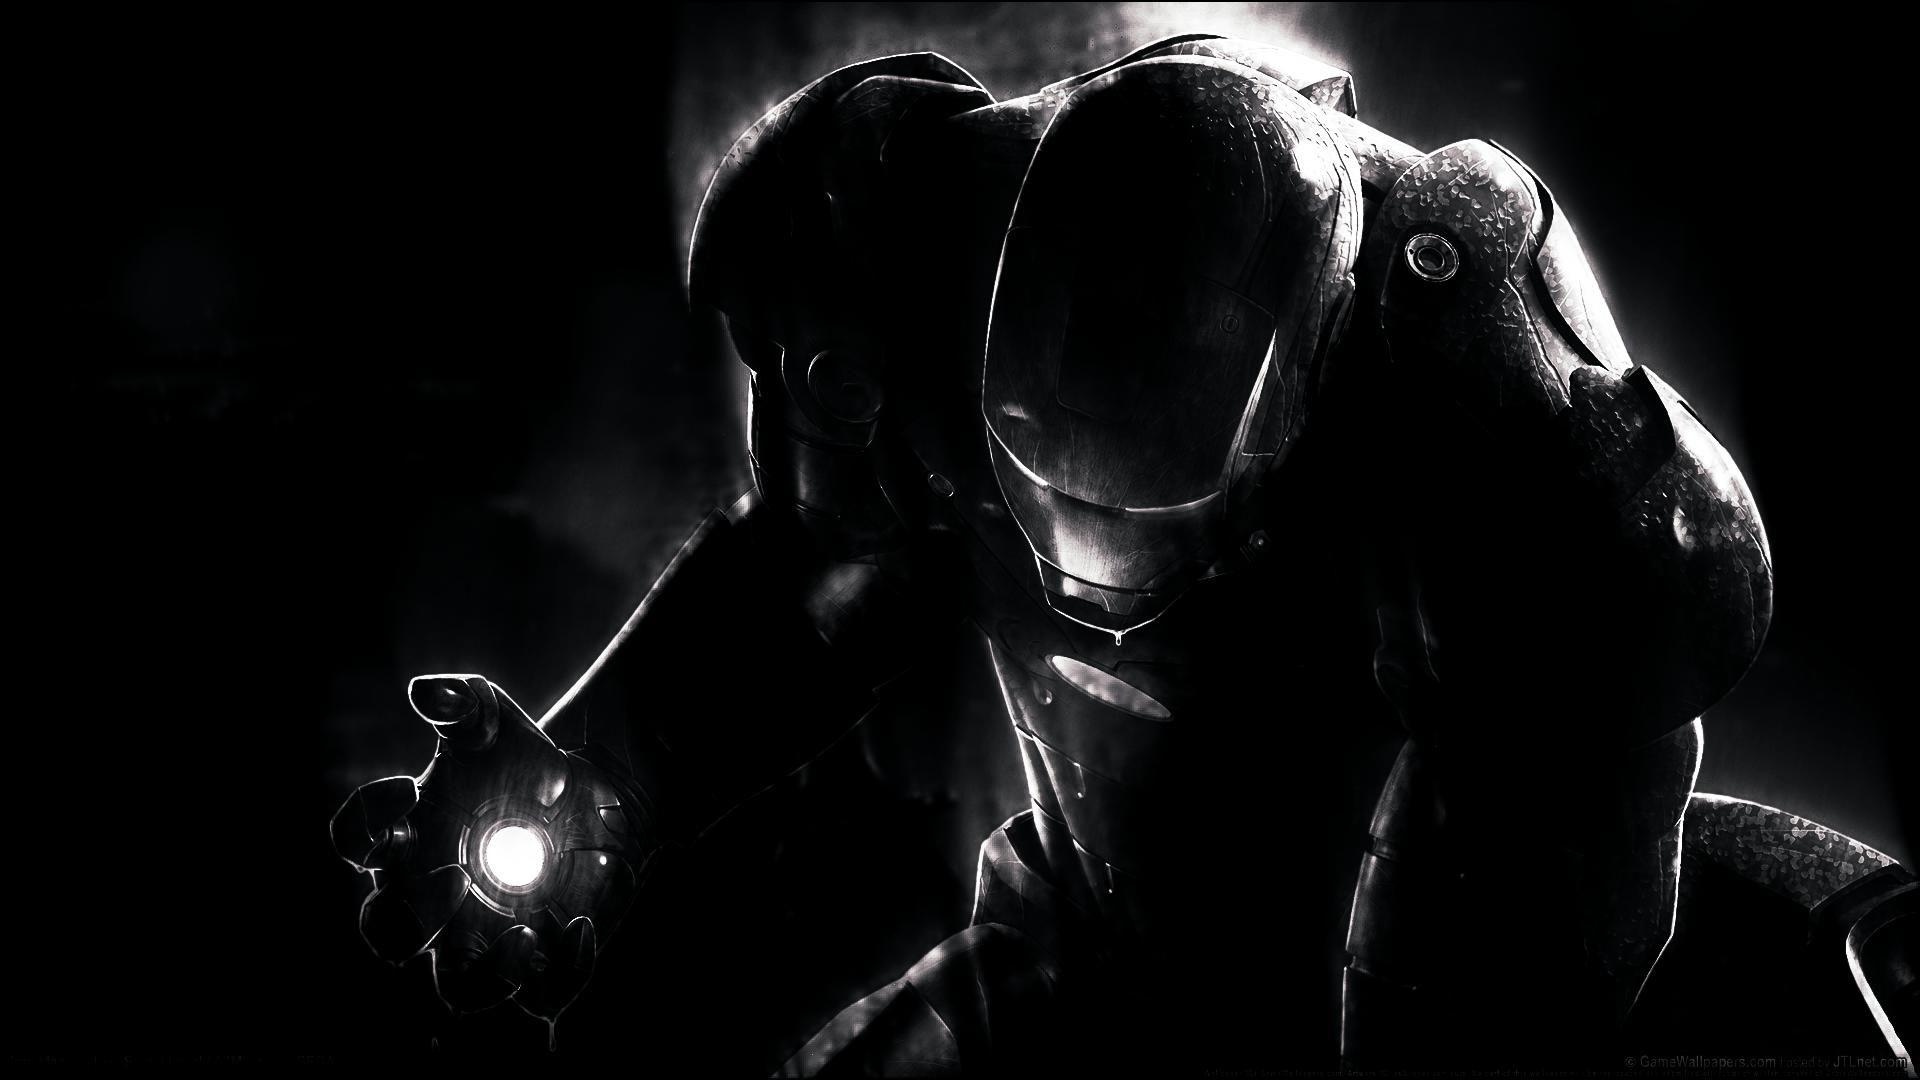 Black Hd Wallpaper Iron Man Hd Wallpaper Iron Man Wallpaper